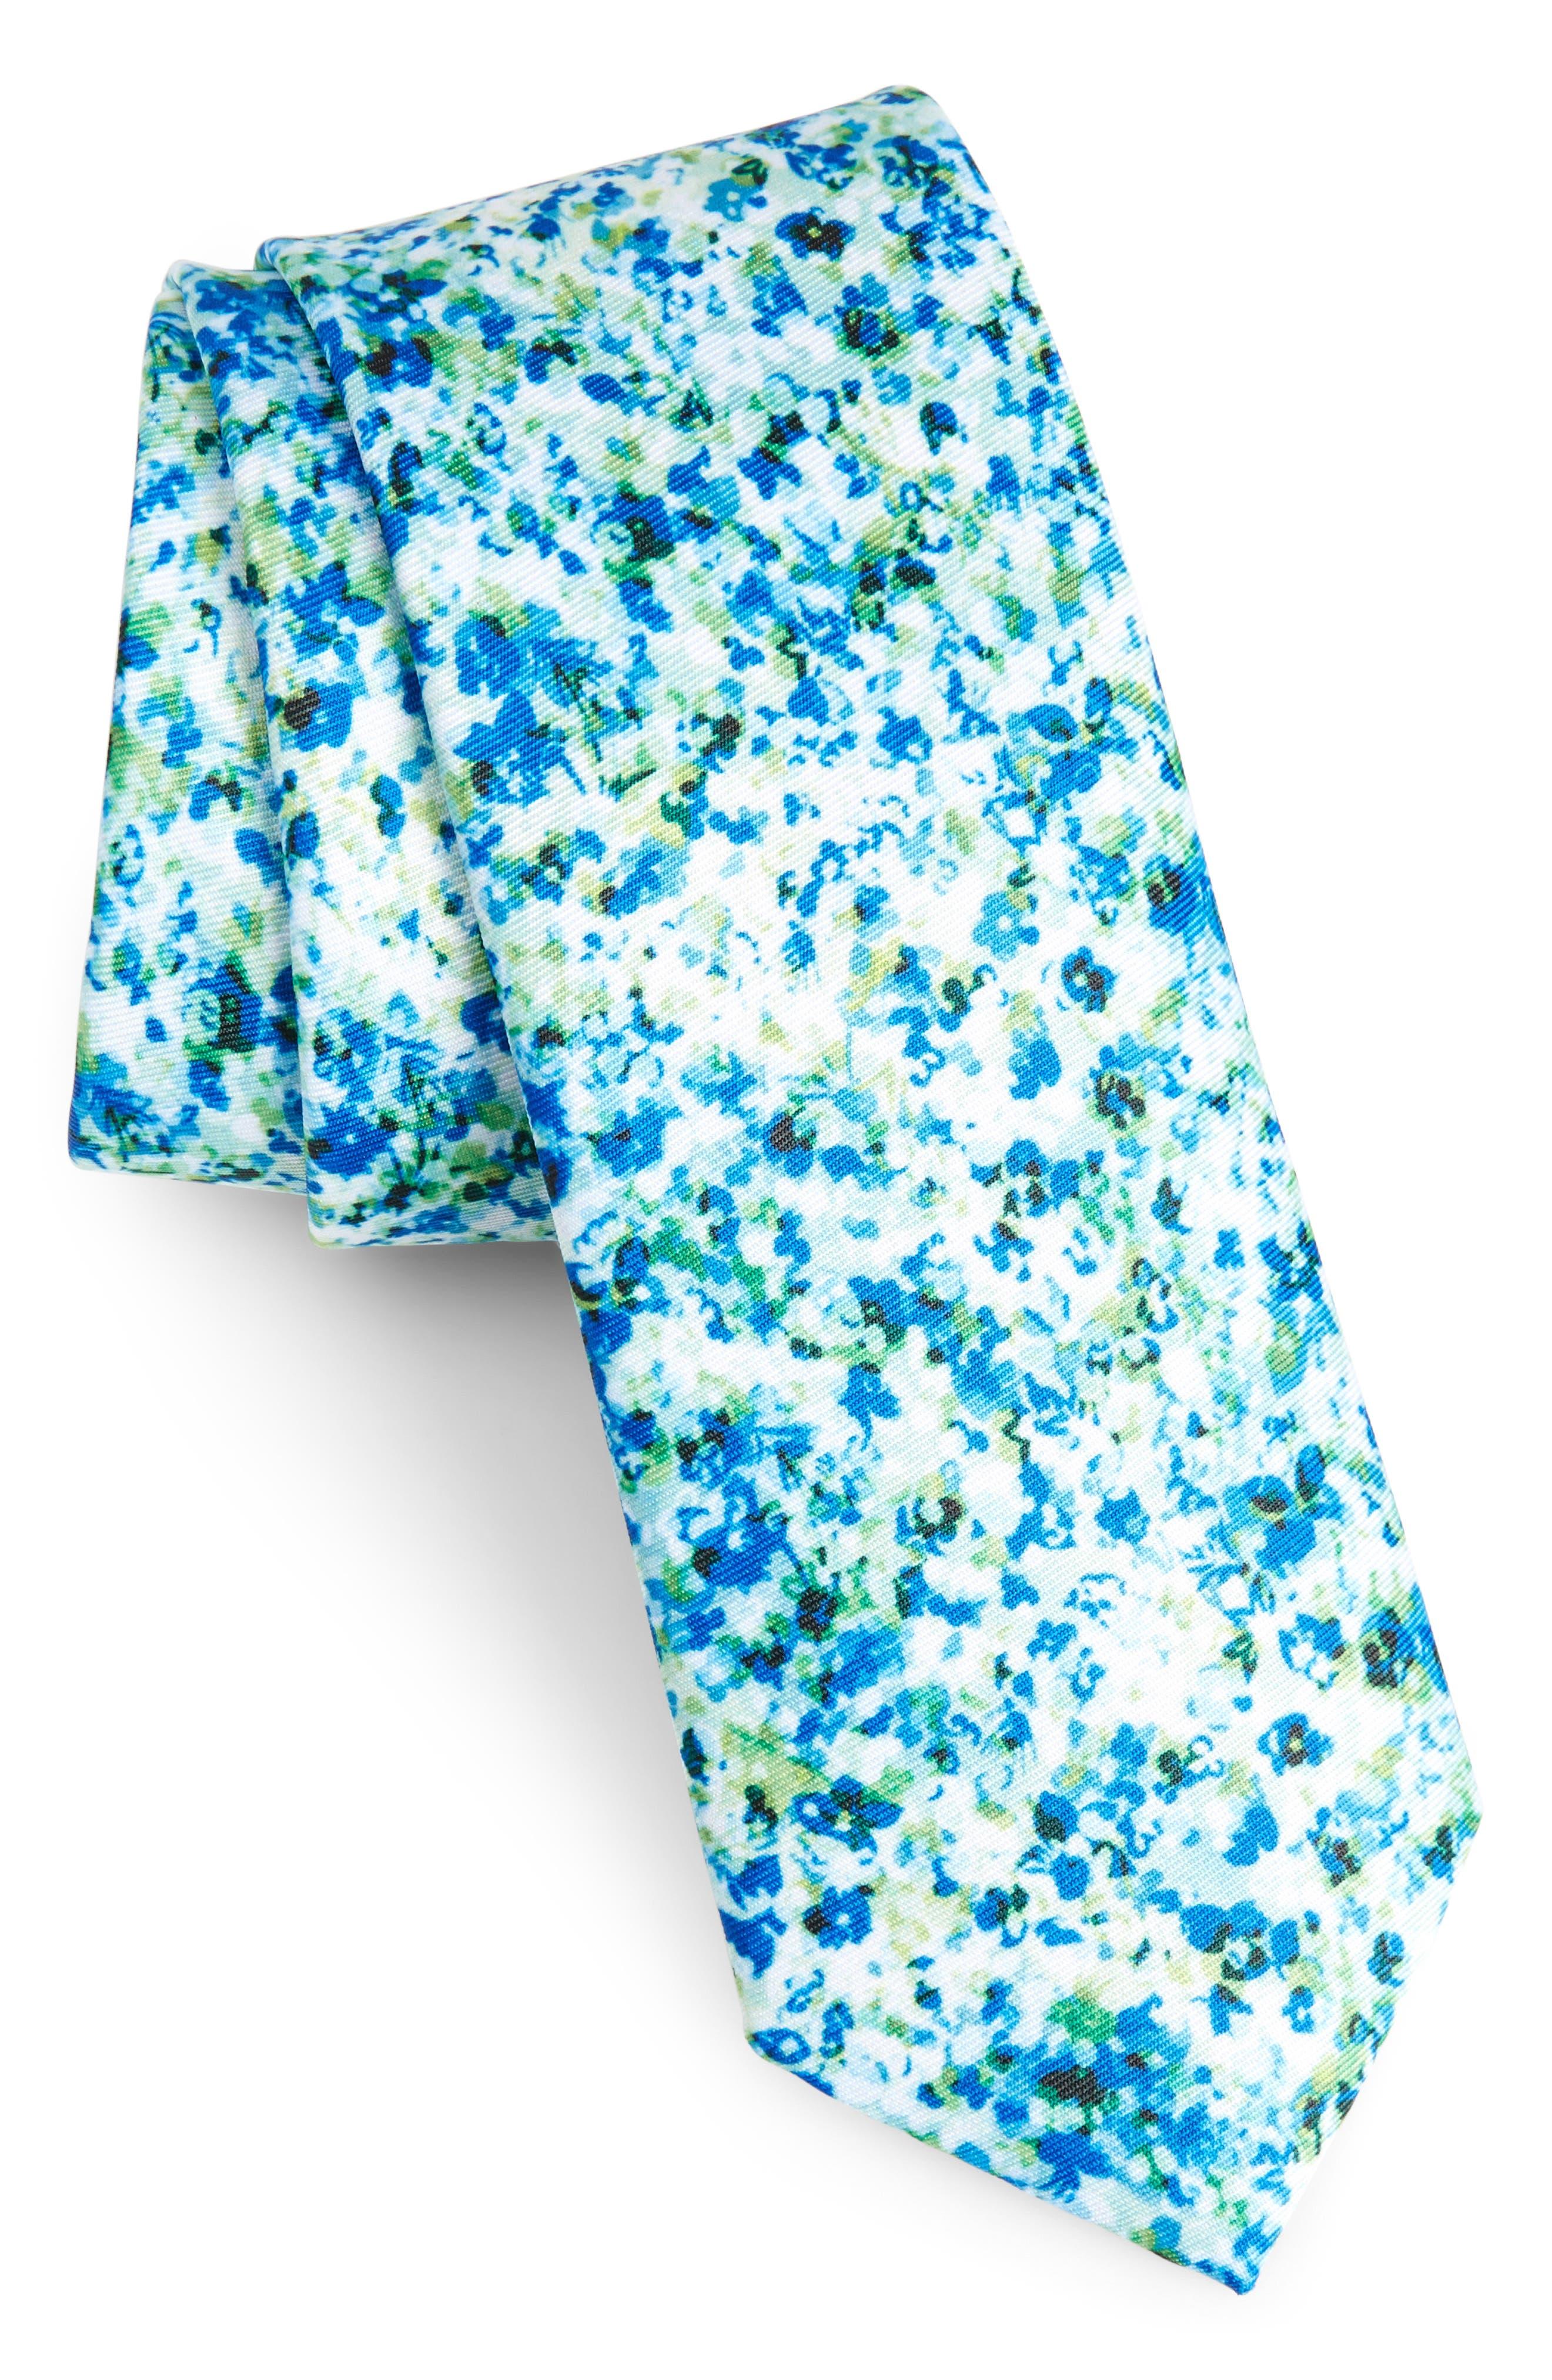 Marquette Floral Skinny Tie,                         Main,                         color, 300